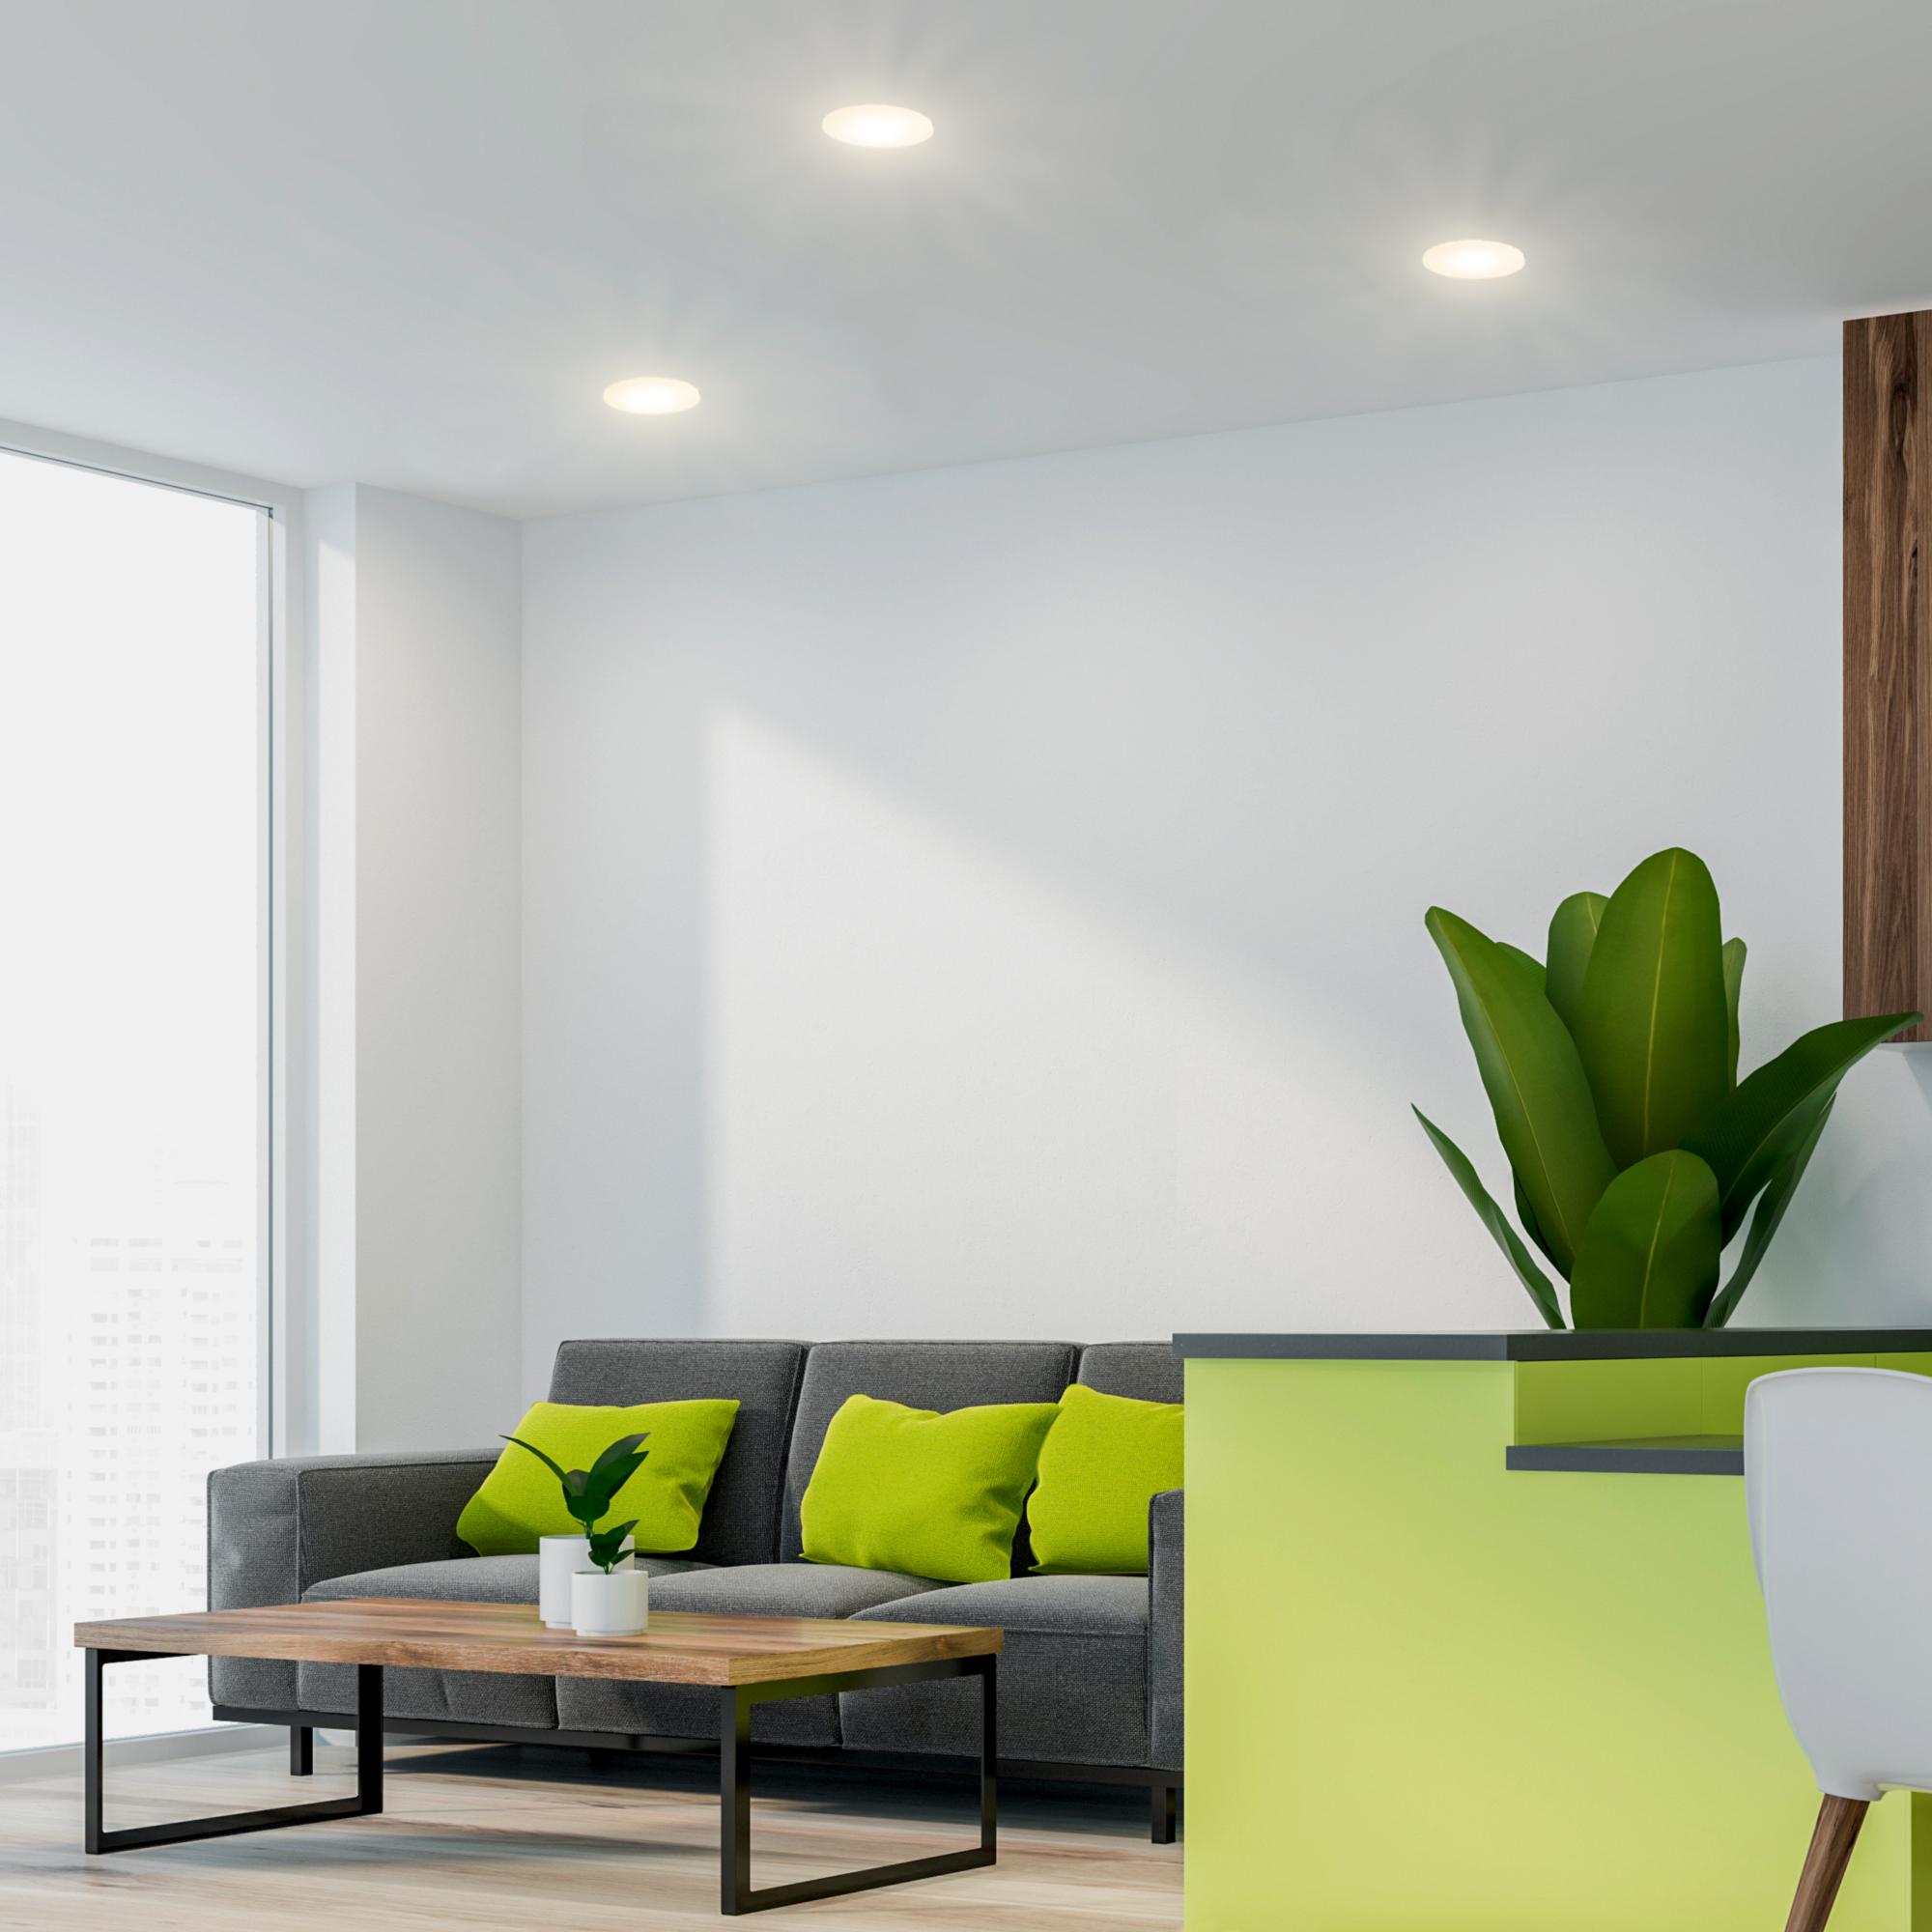 Randloses & flaches LED Einbaupanel paniled mit 18 Watt warmweiß 18V Panel  rund